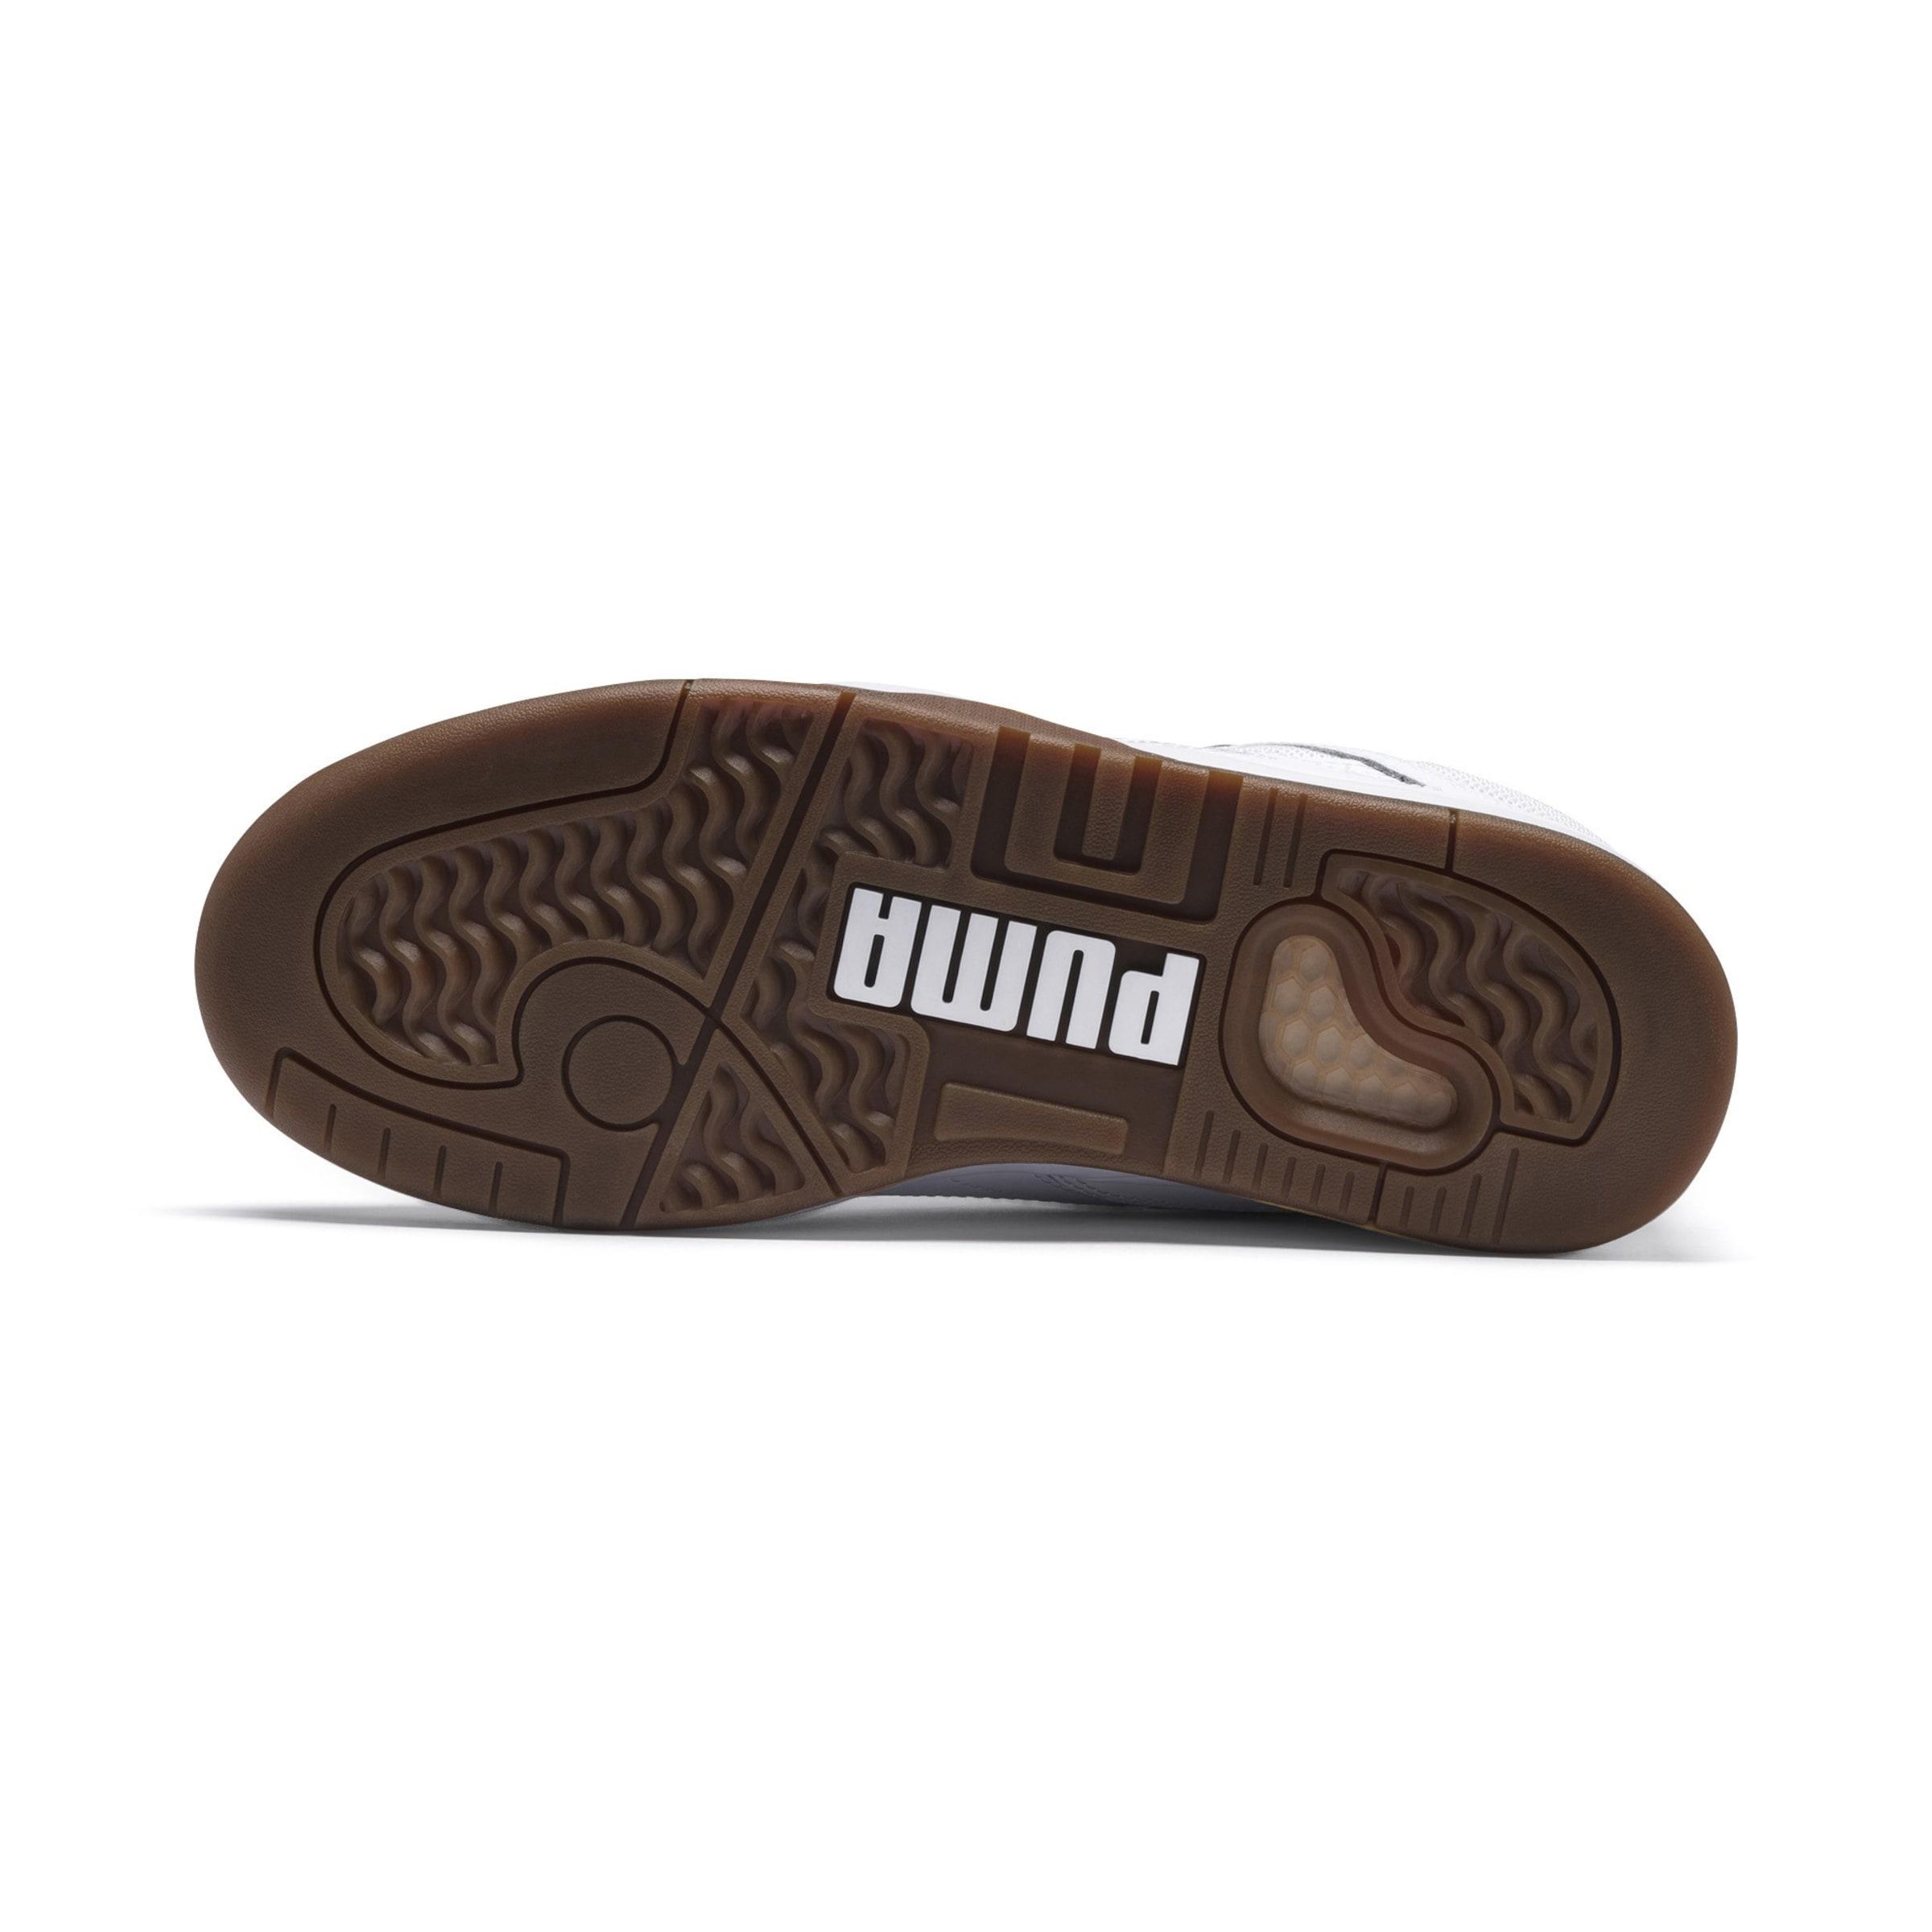 In Sneaker KastanienbraunSchwarz Guard' 'palace Weiß Puma YD2IbWHeE9